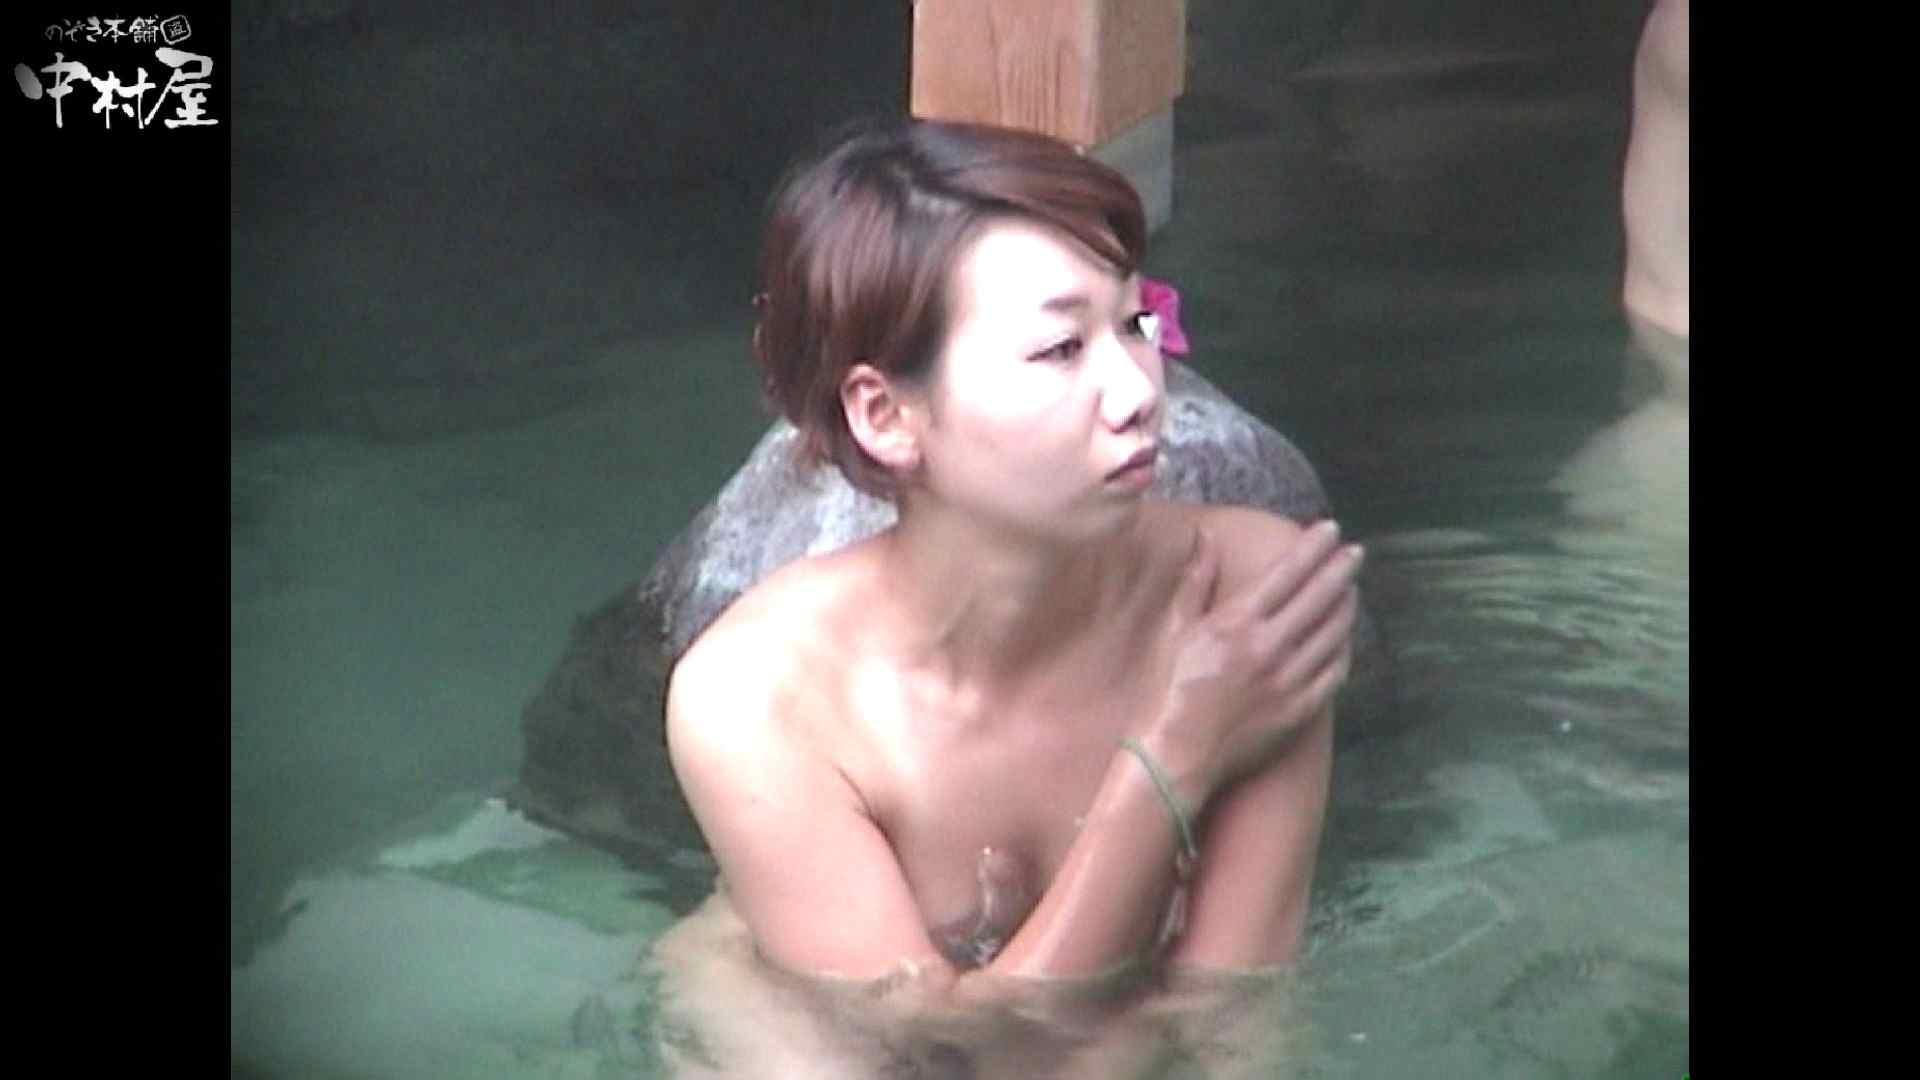 Aquaな露天風呂Vol.951 盗撮映像  93Pix 8